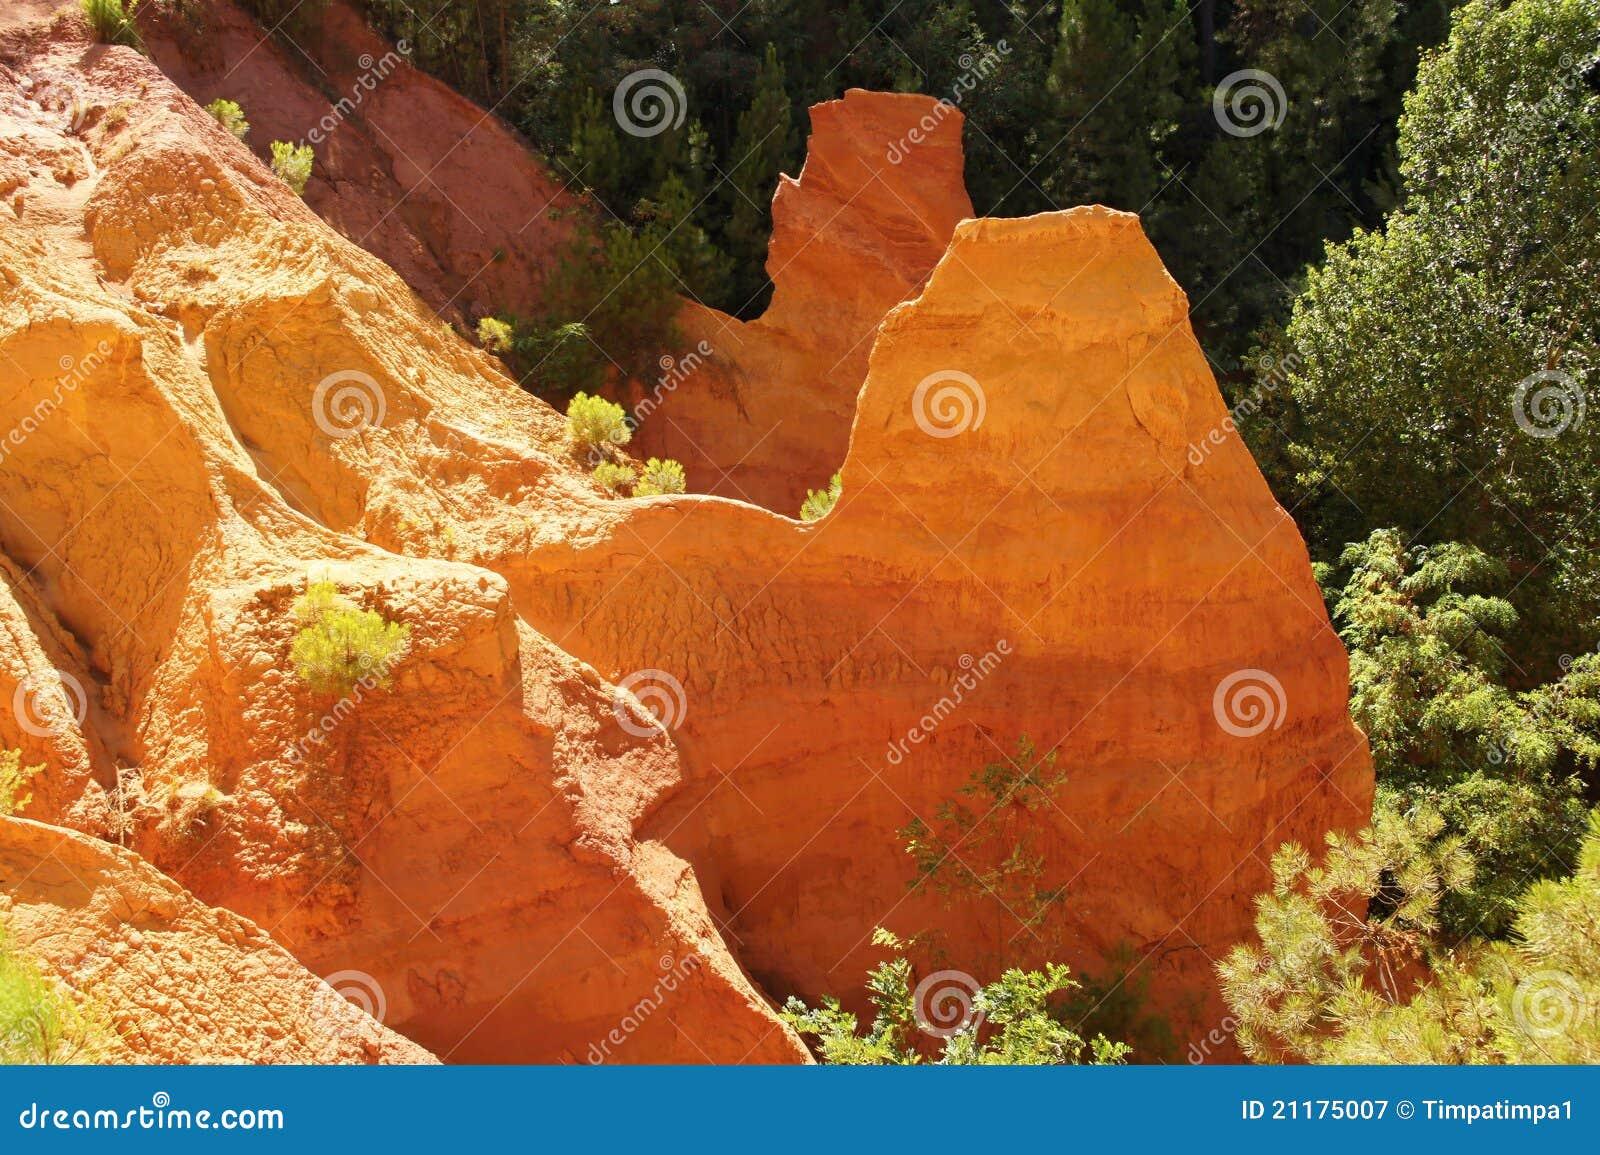 Ochre stone pit near Roussillion, Provence